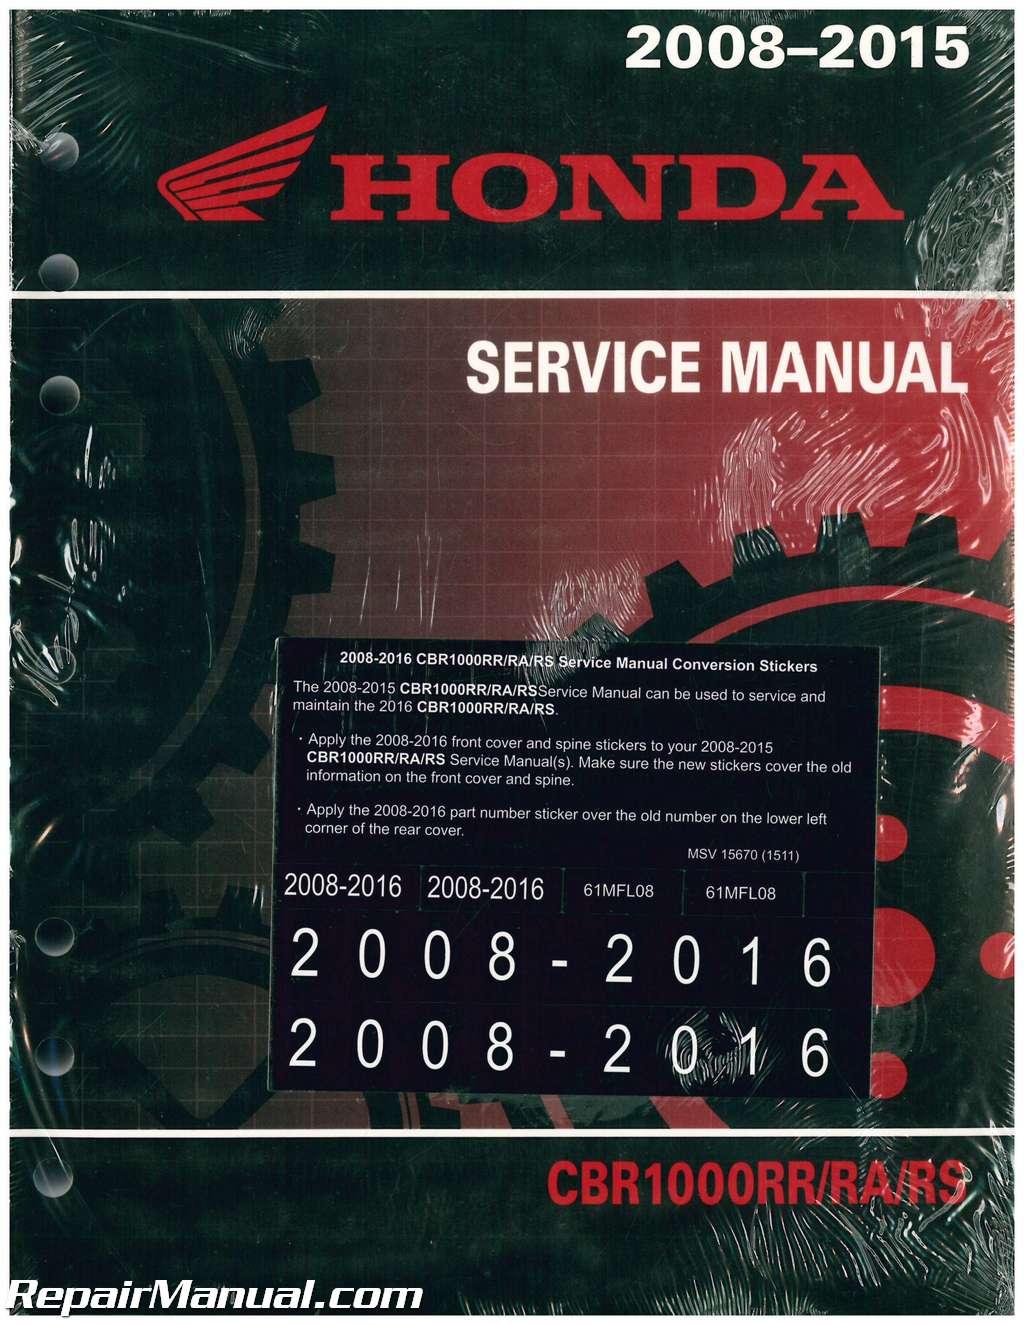 Honda Cbr1000rr 2004 2005 Wiring Harness Diagram R6 2008 2016 Motorcycle Service Manual Rh Repairmanual Com 1966 Accord